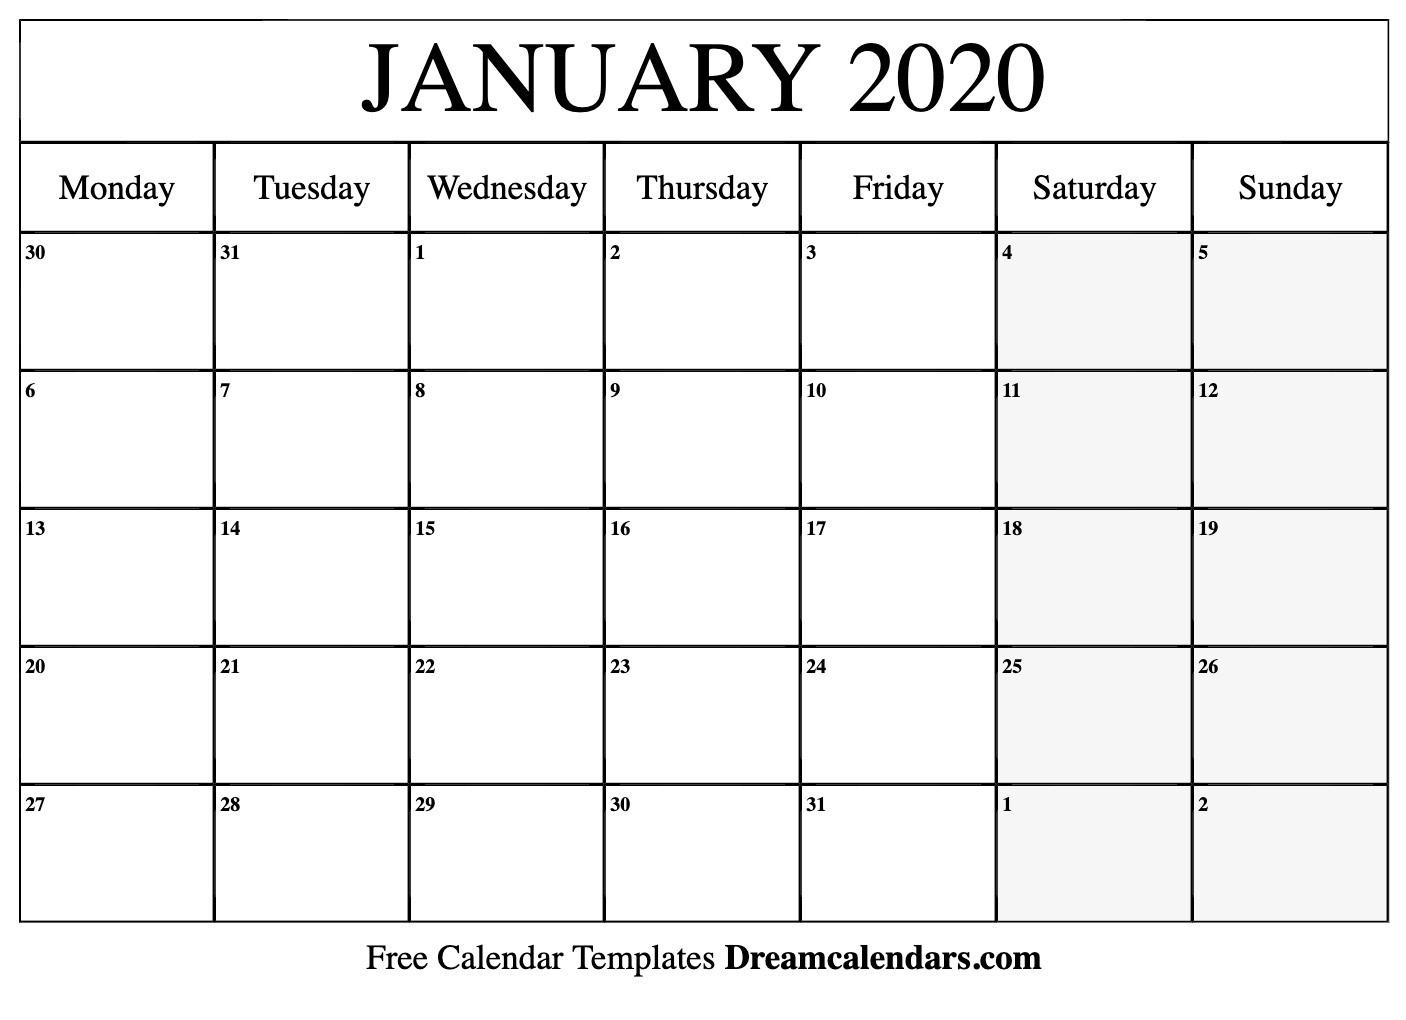 Printable January 2020 Calendar-Blank January 2020 Calendar Printable